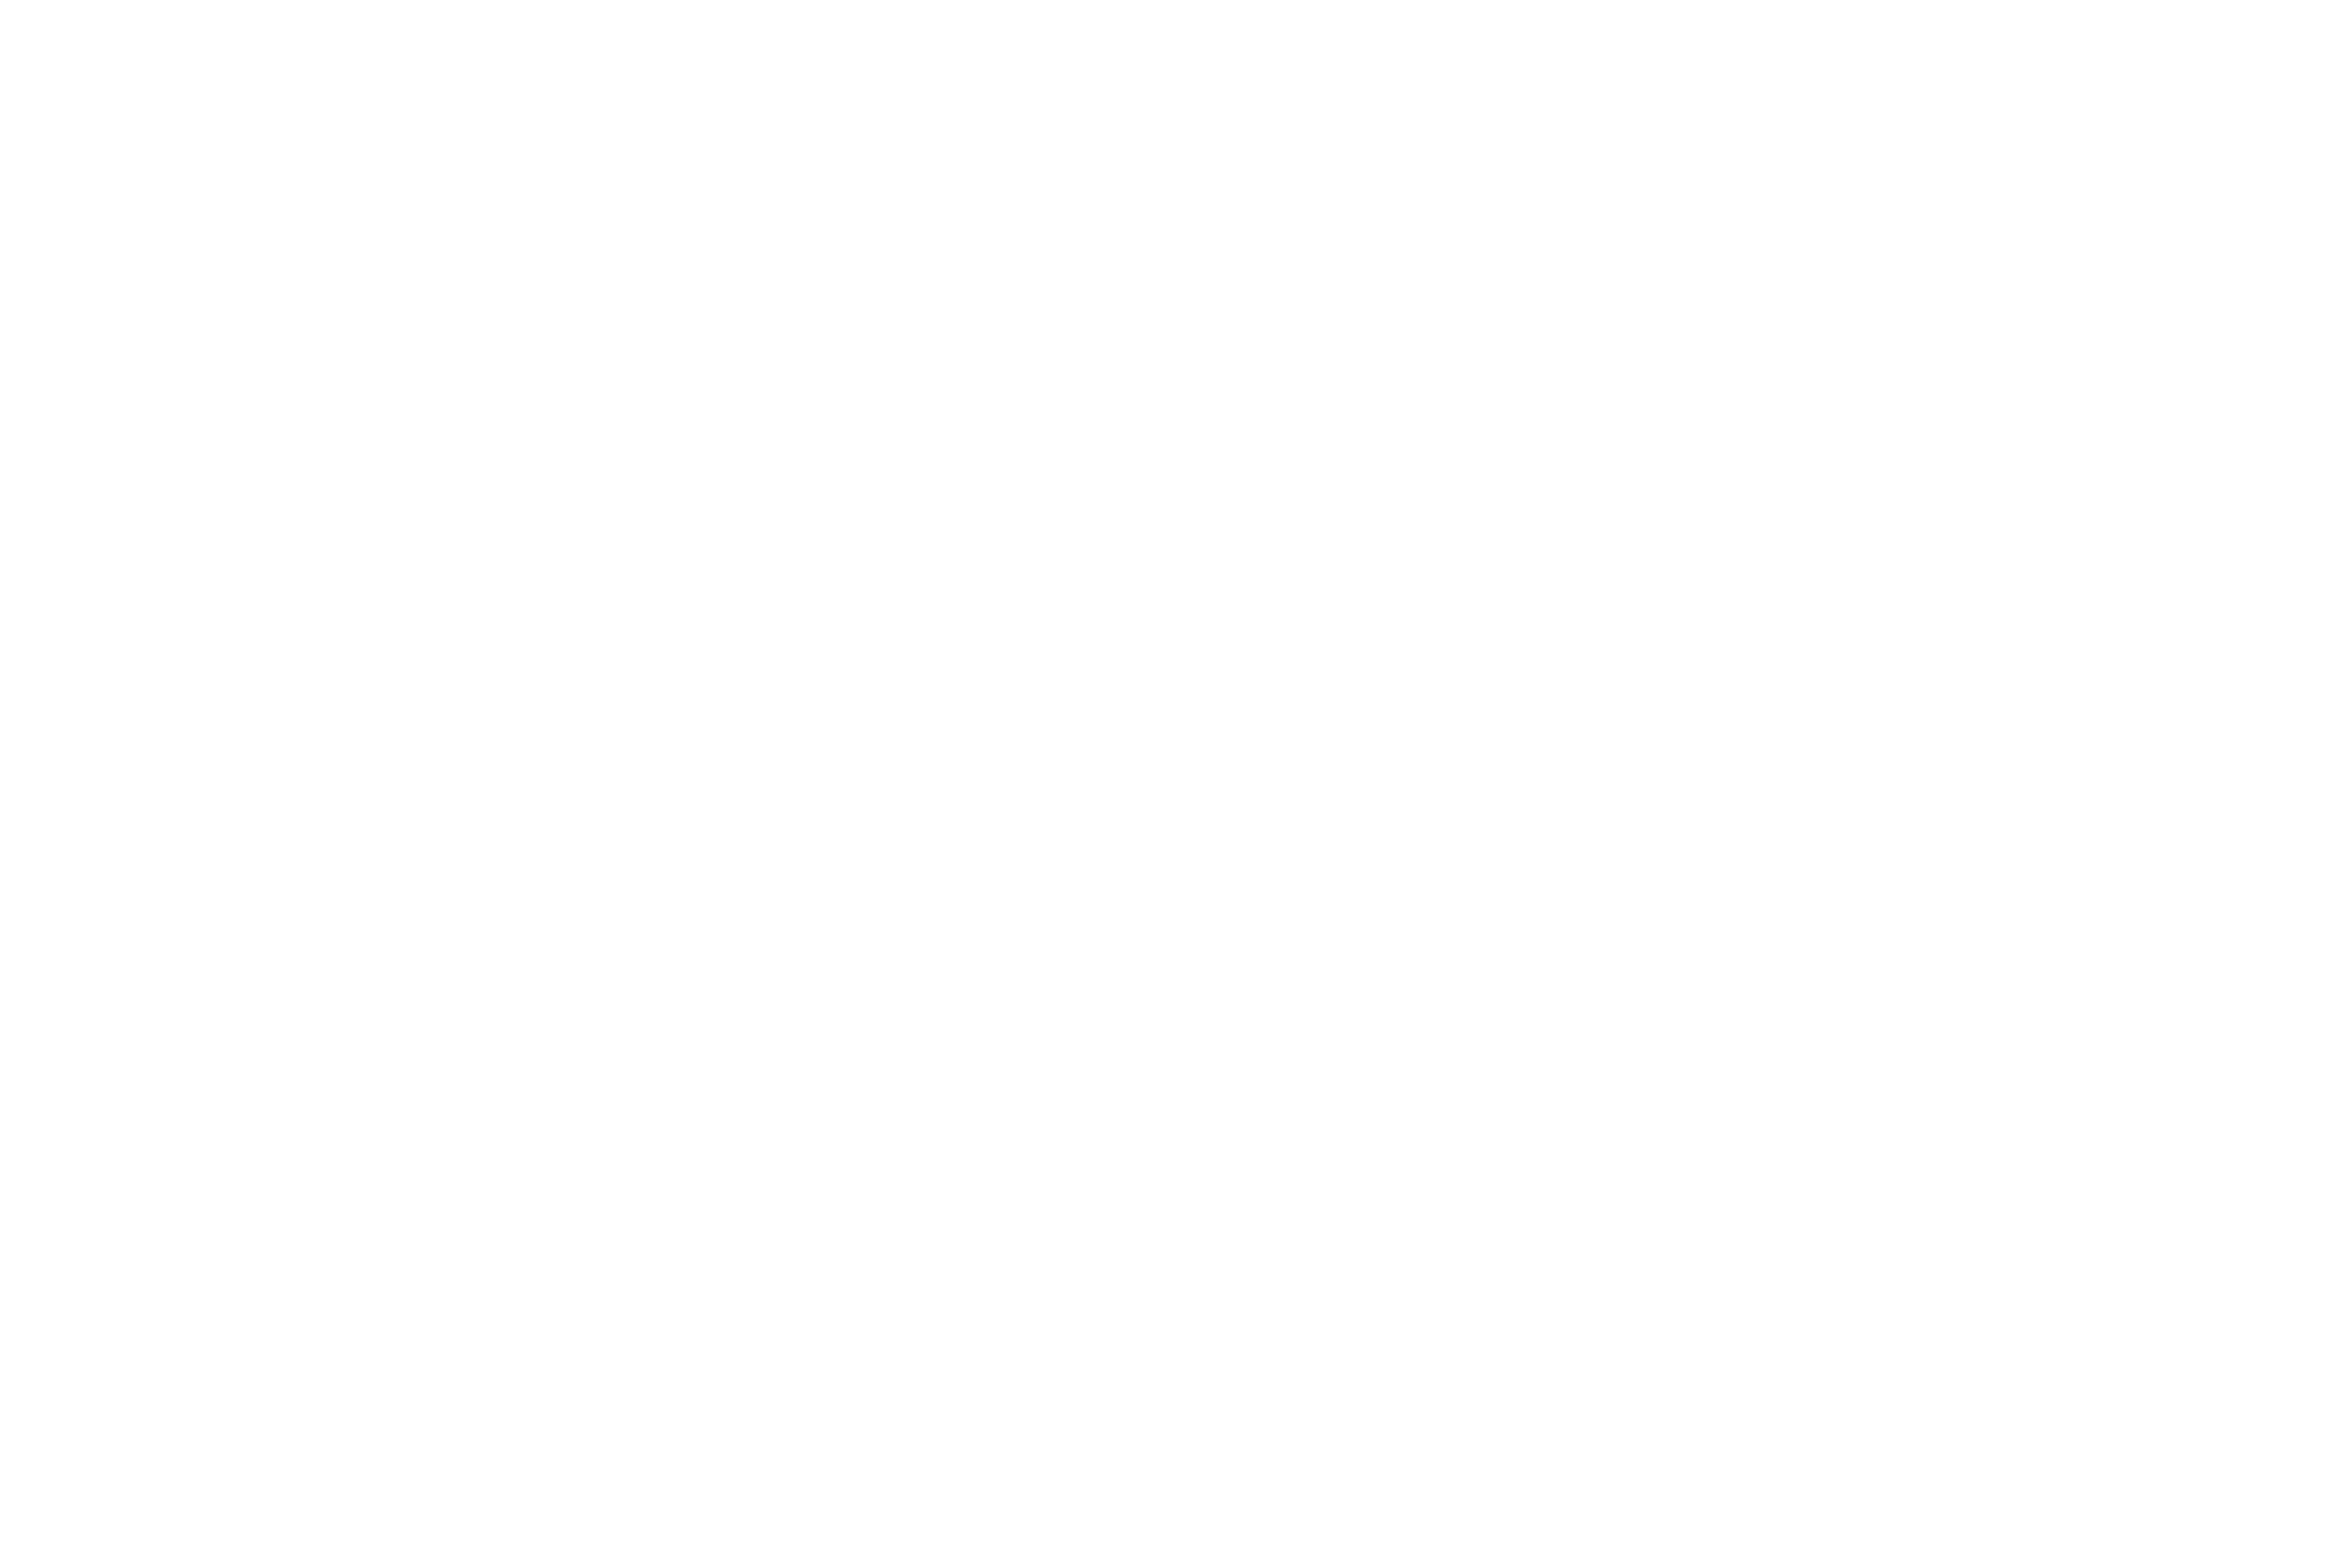 rj0107